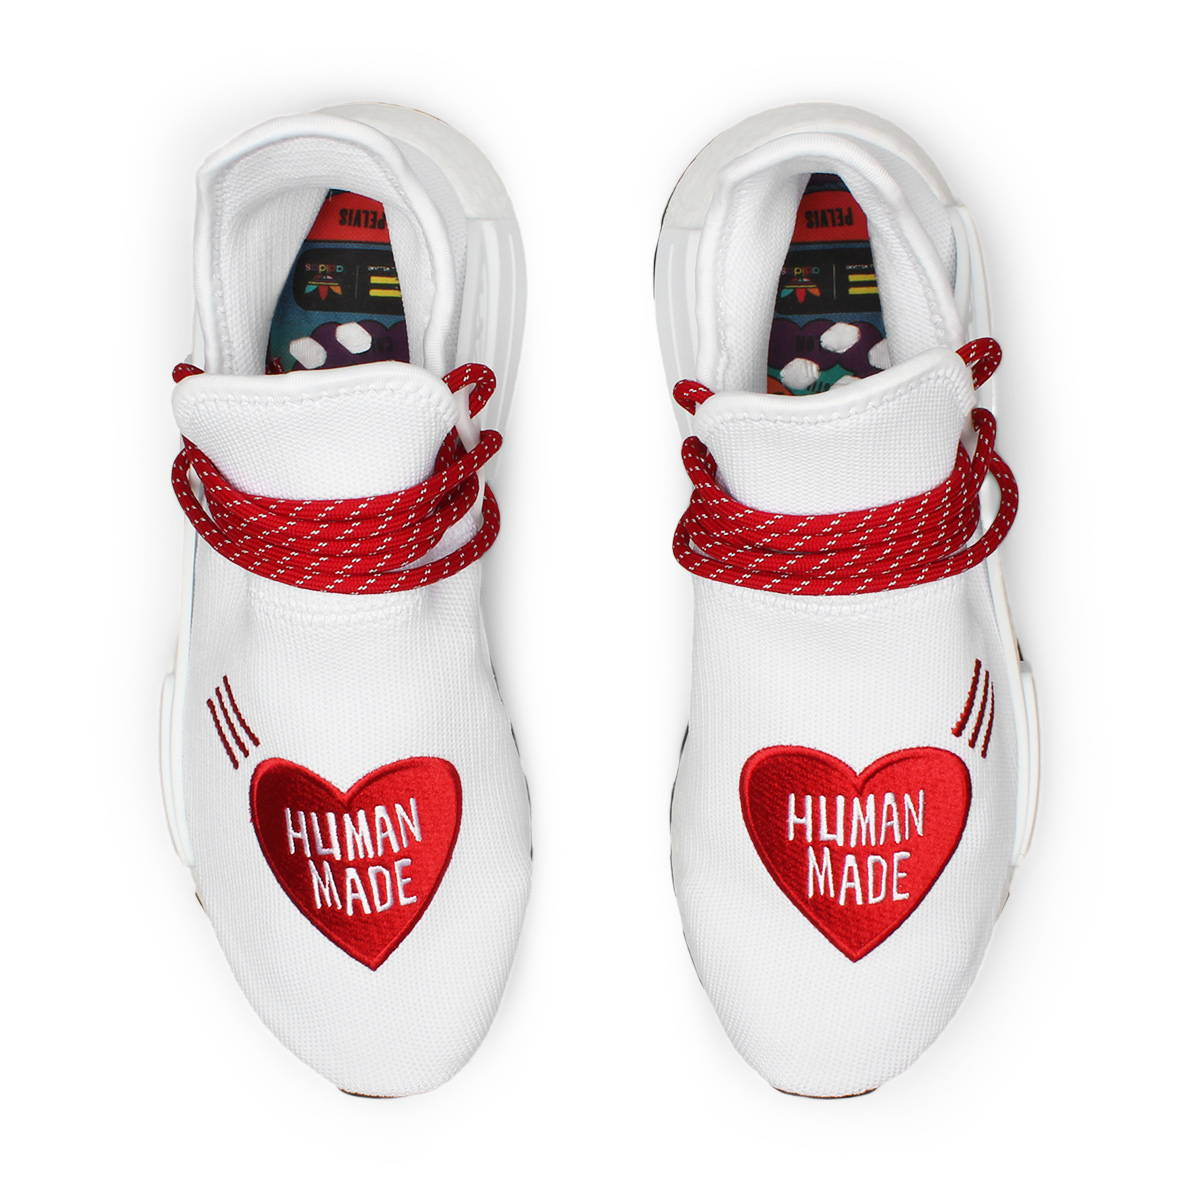 10/5/19: adidas x Human Race x Human Made NMD Hu (QS) – Bodega